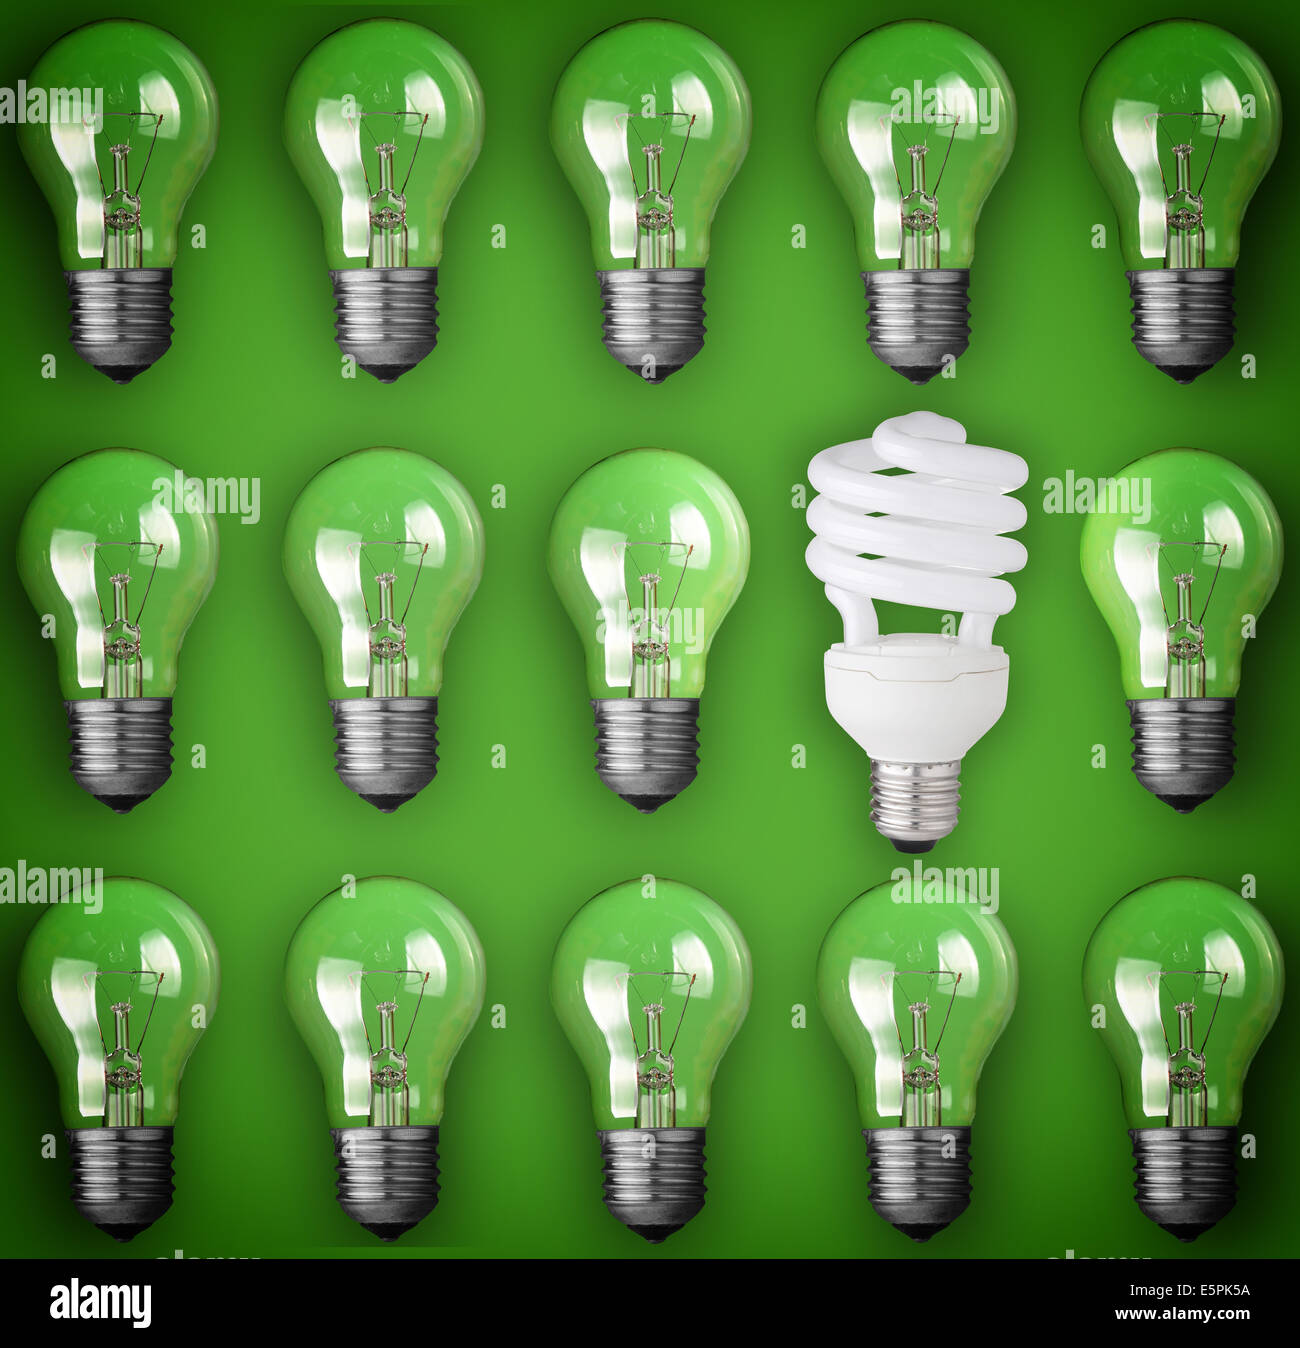 Idea concept light bulb - Stock Image